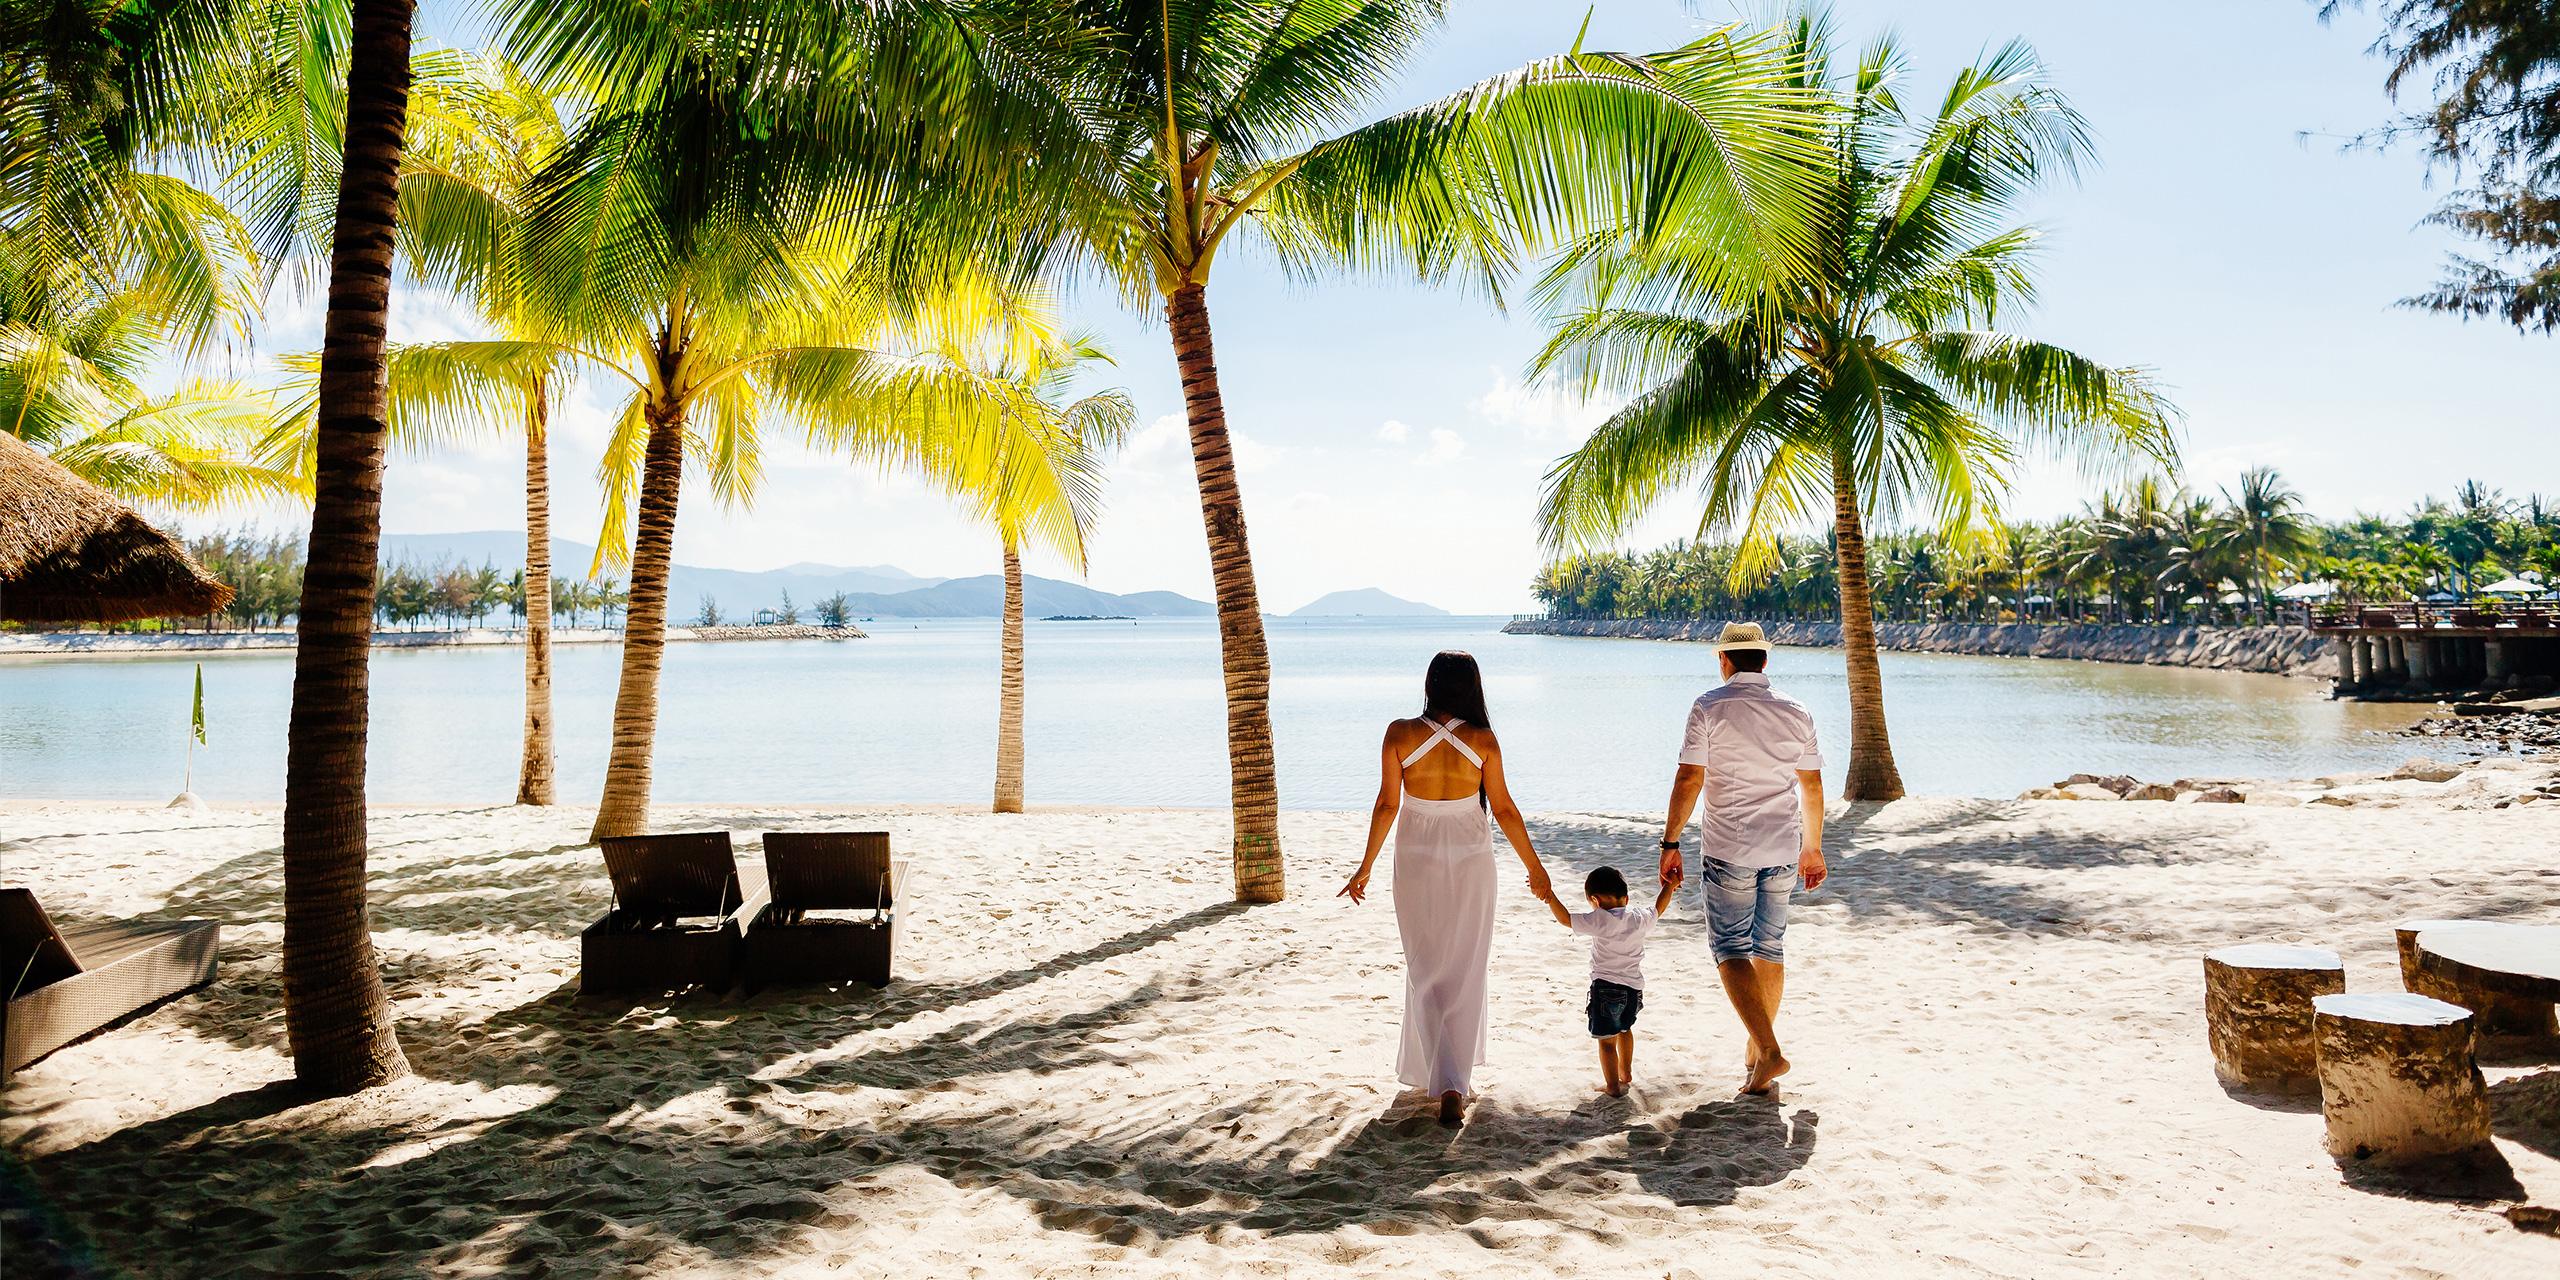 family walking along beach palm trees; Courtesy of shevtsovy/Shutterstock